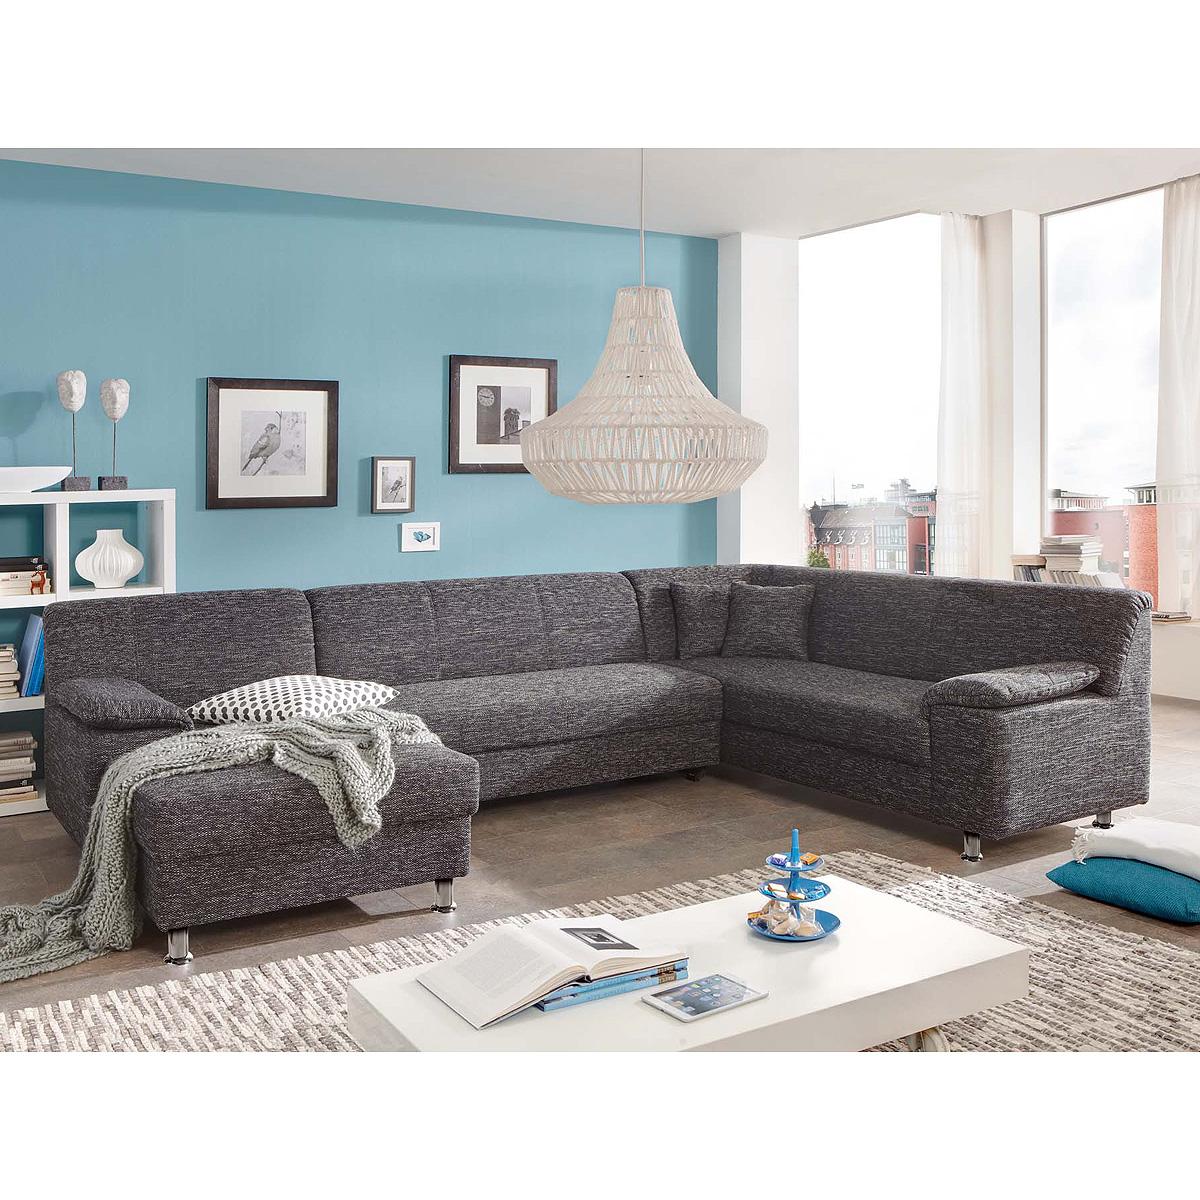 sofa im kolonialstil gunstig kreative ideen f r. Black Bedroom Furniture Sets. Home Design Ideas